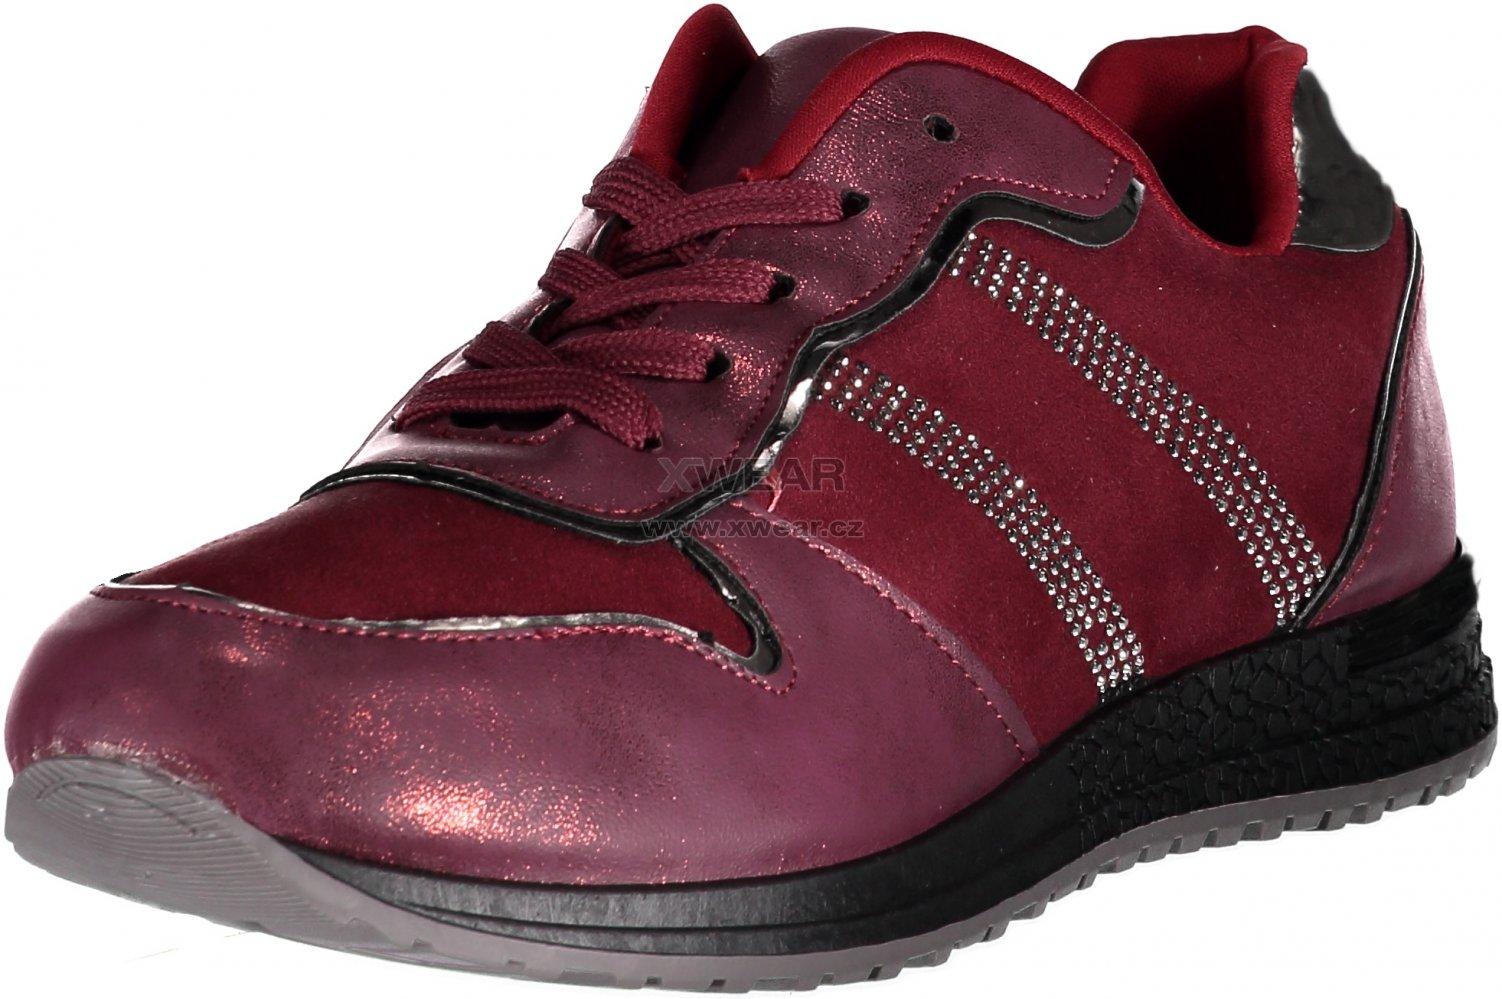 1e577bb19d8 Dámské boty VICES 8438-42 RED velikost  36   XWEAR.cz